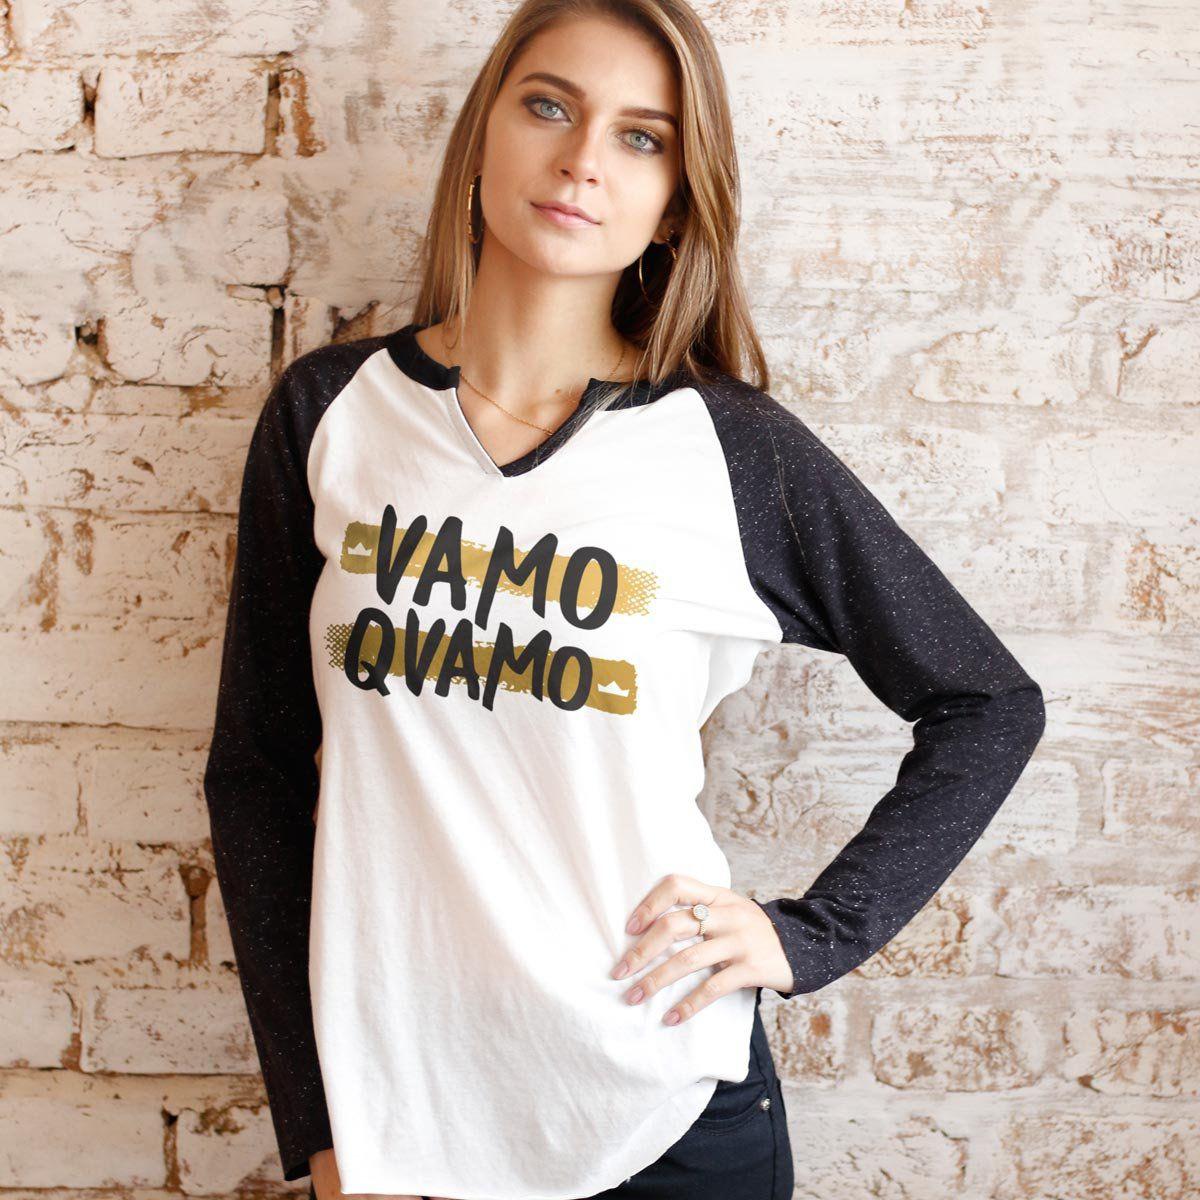 Camiseta Manga Longa Feminina Thiaguinho #VamoQVamo Gold  - bandUP Store Marketplace